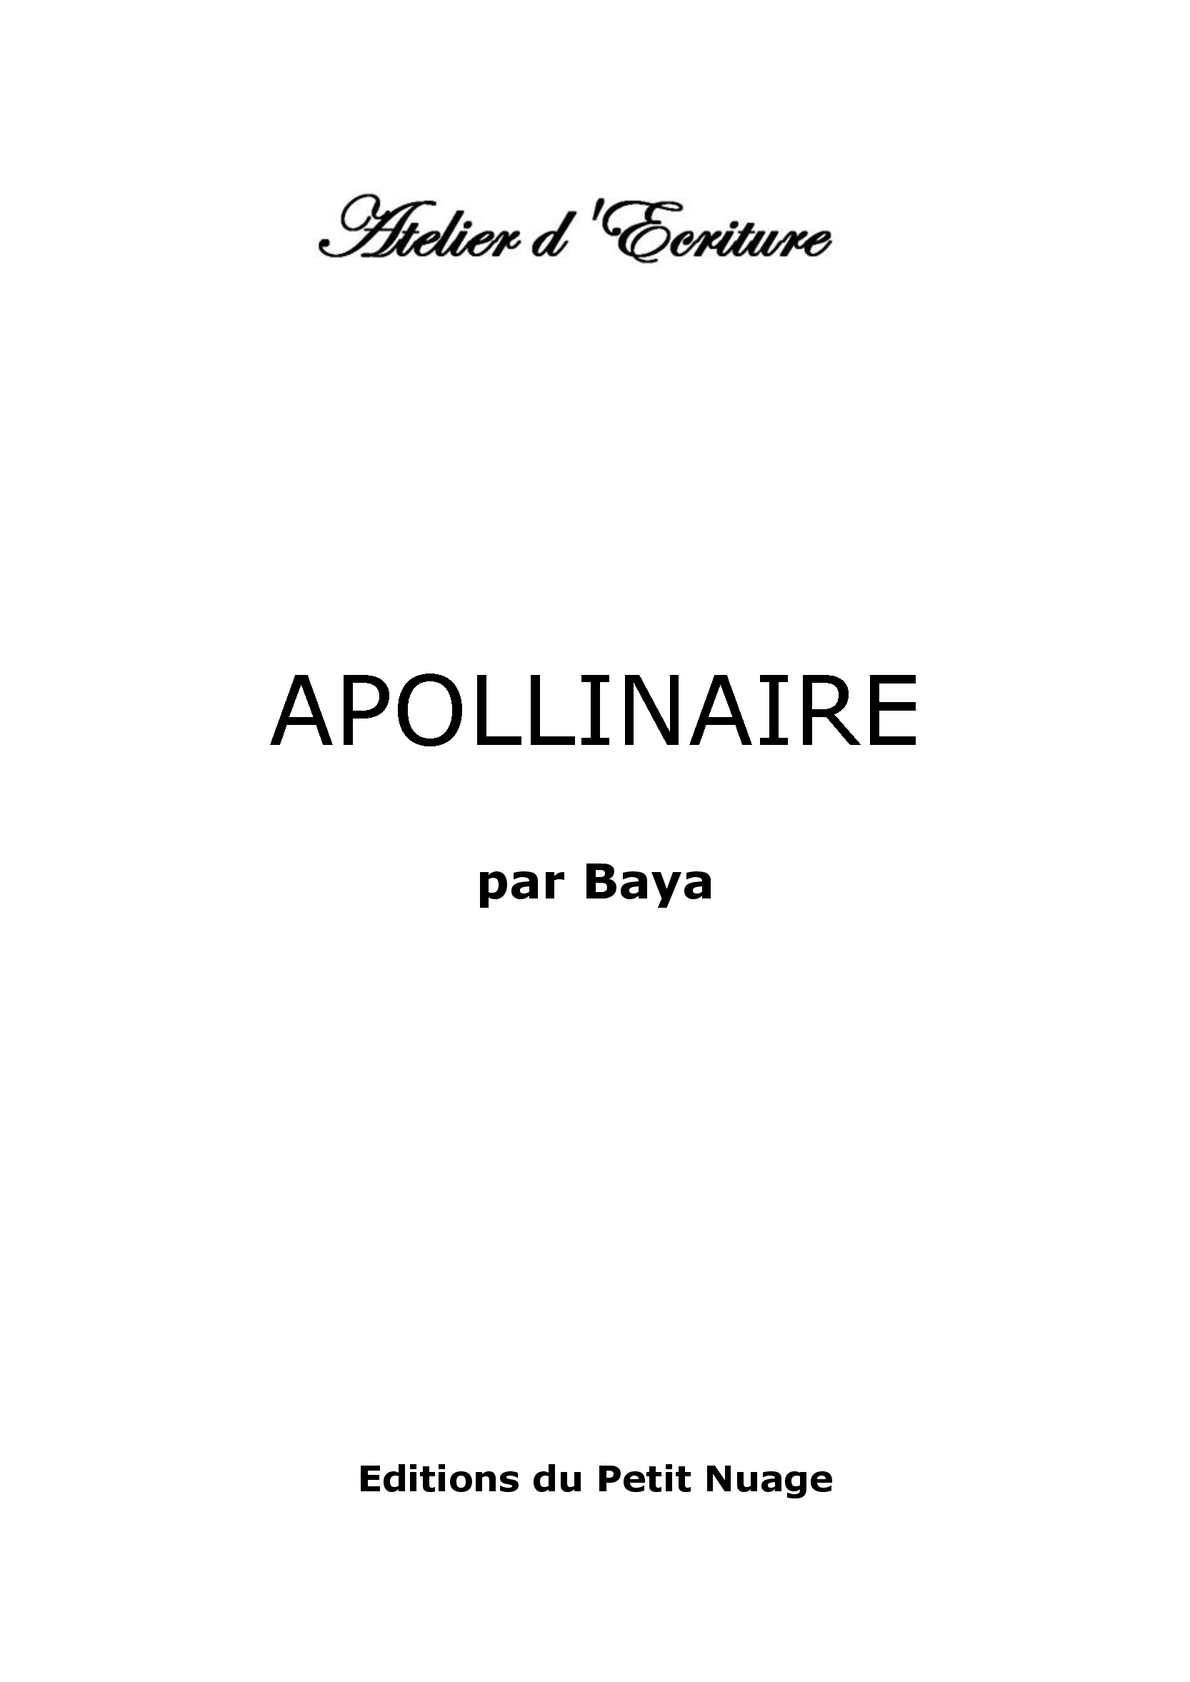 APOLLINAIRE par Baya